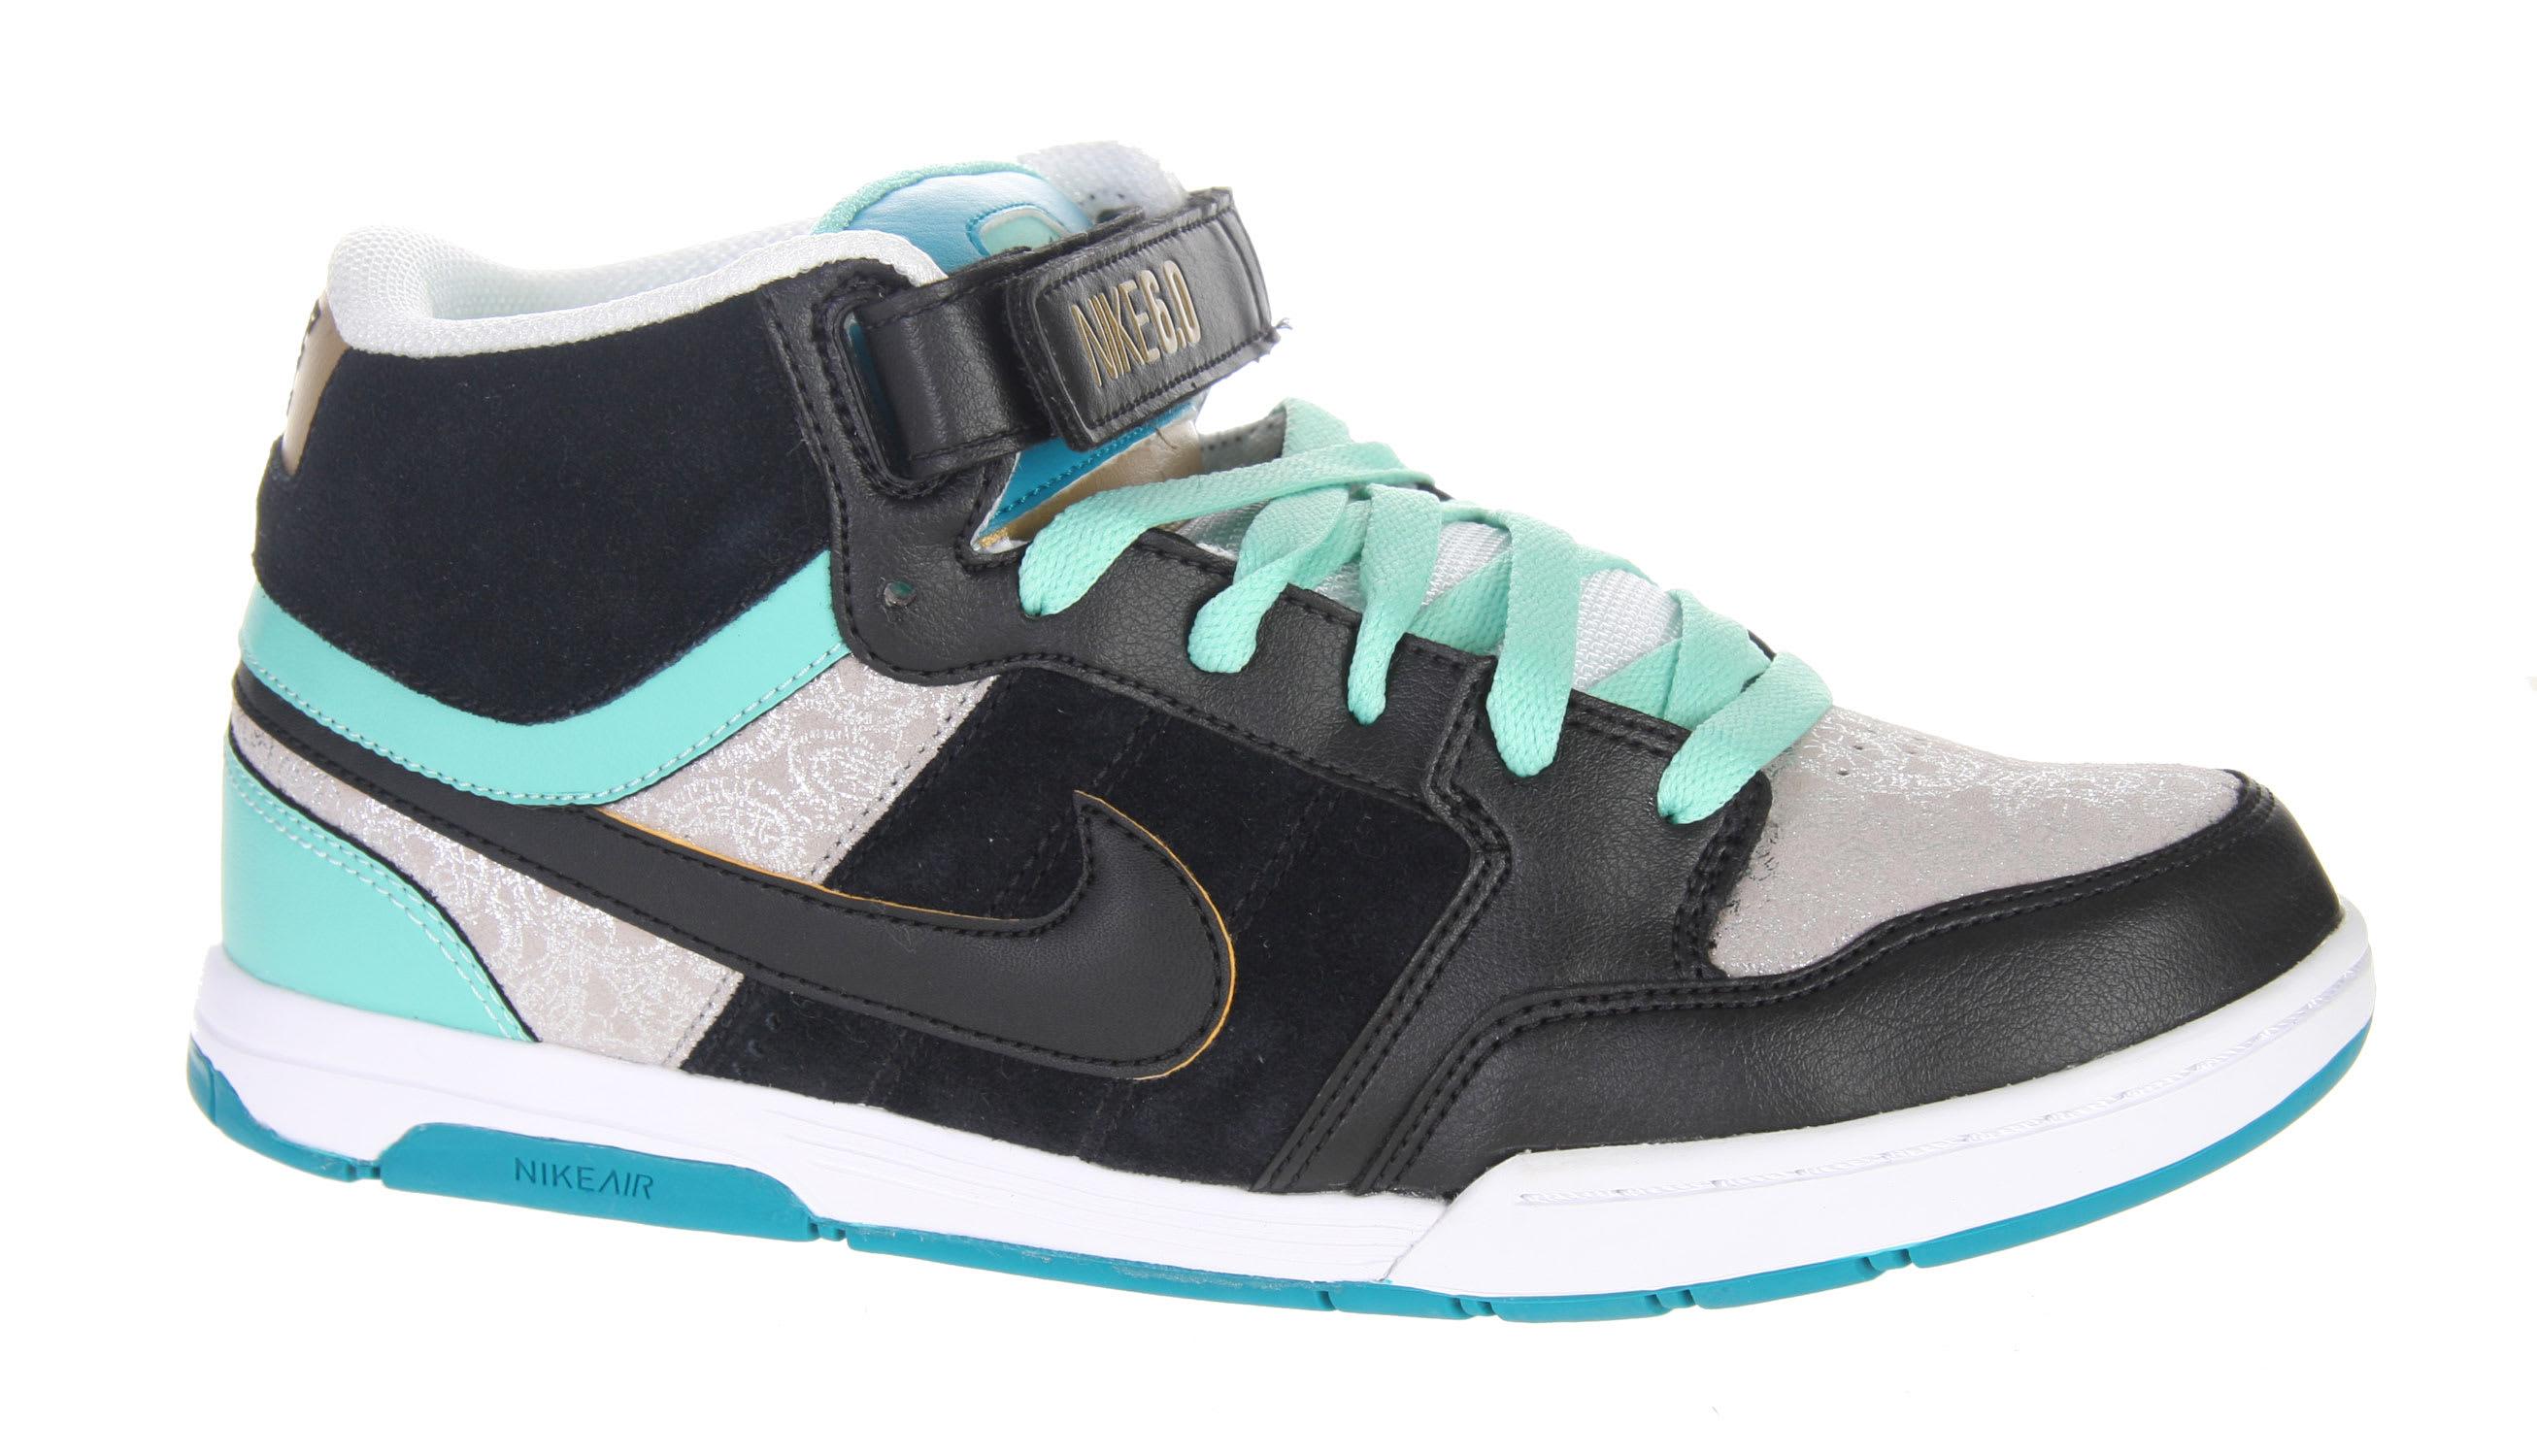 nike air mogan mid skate shoes